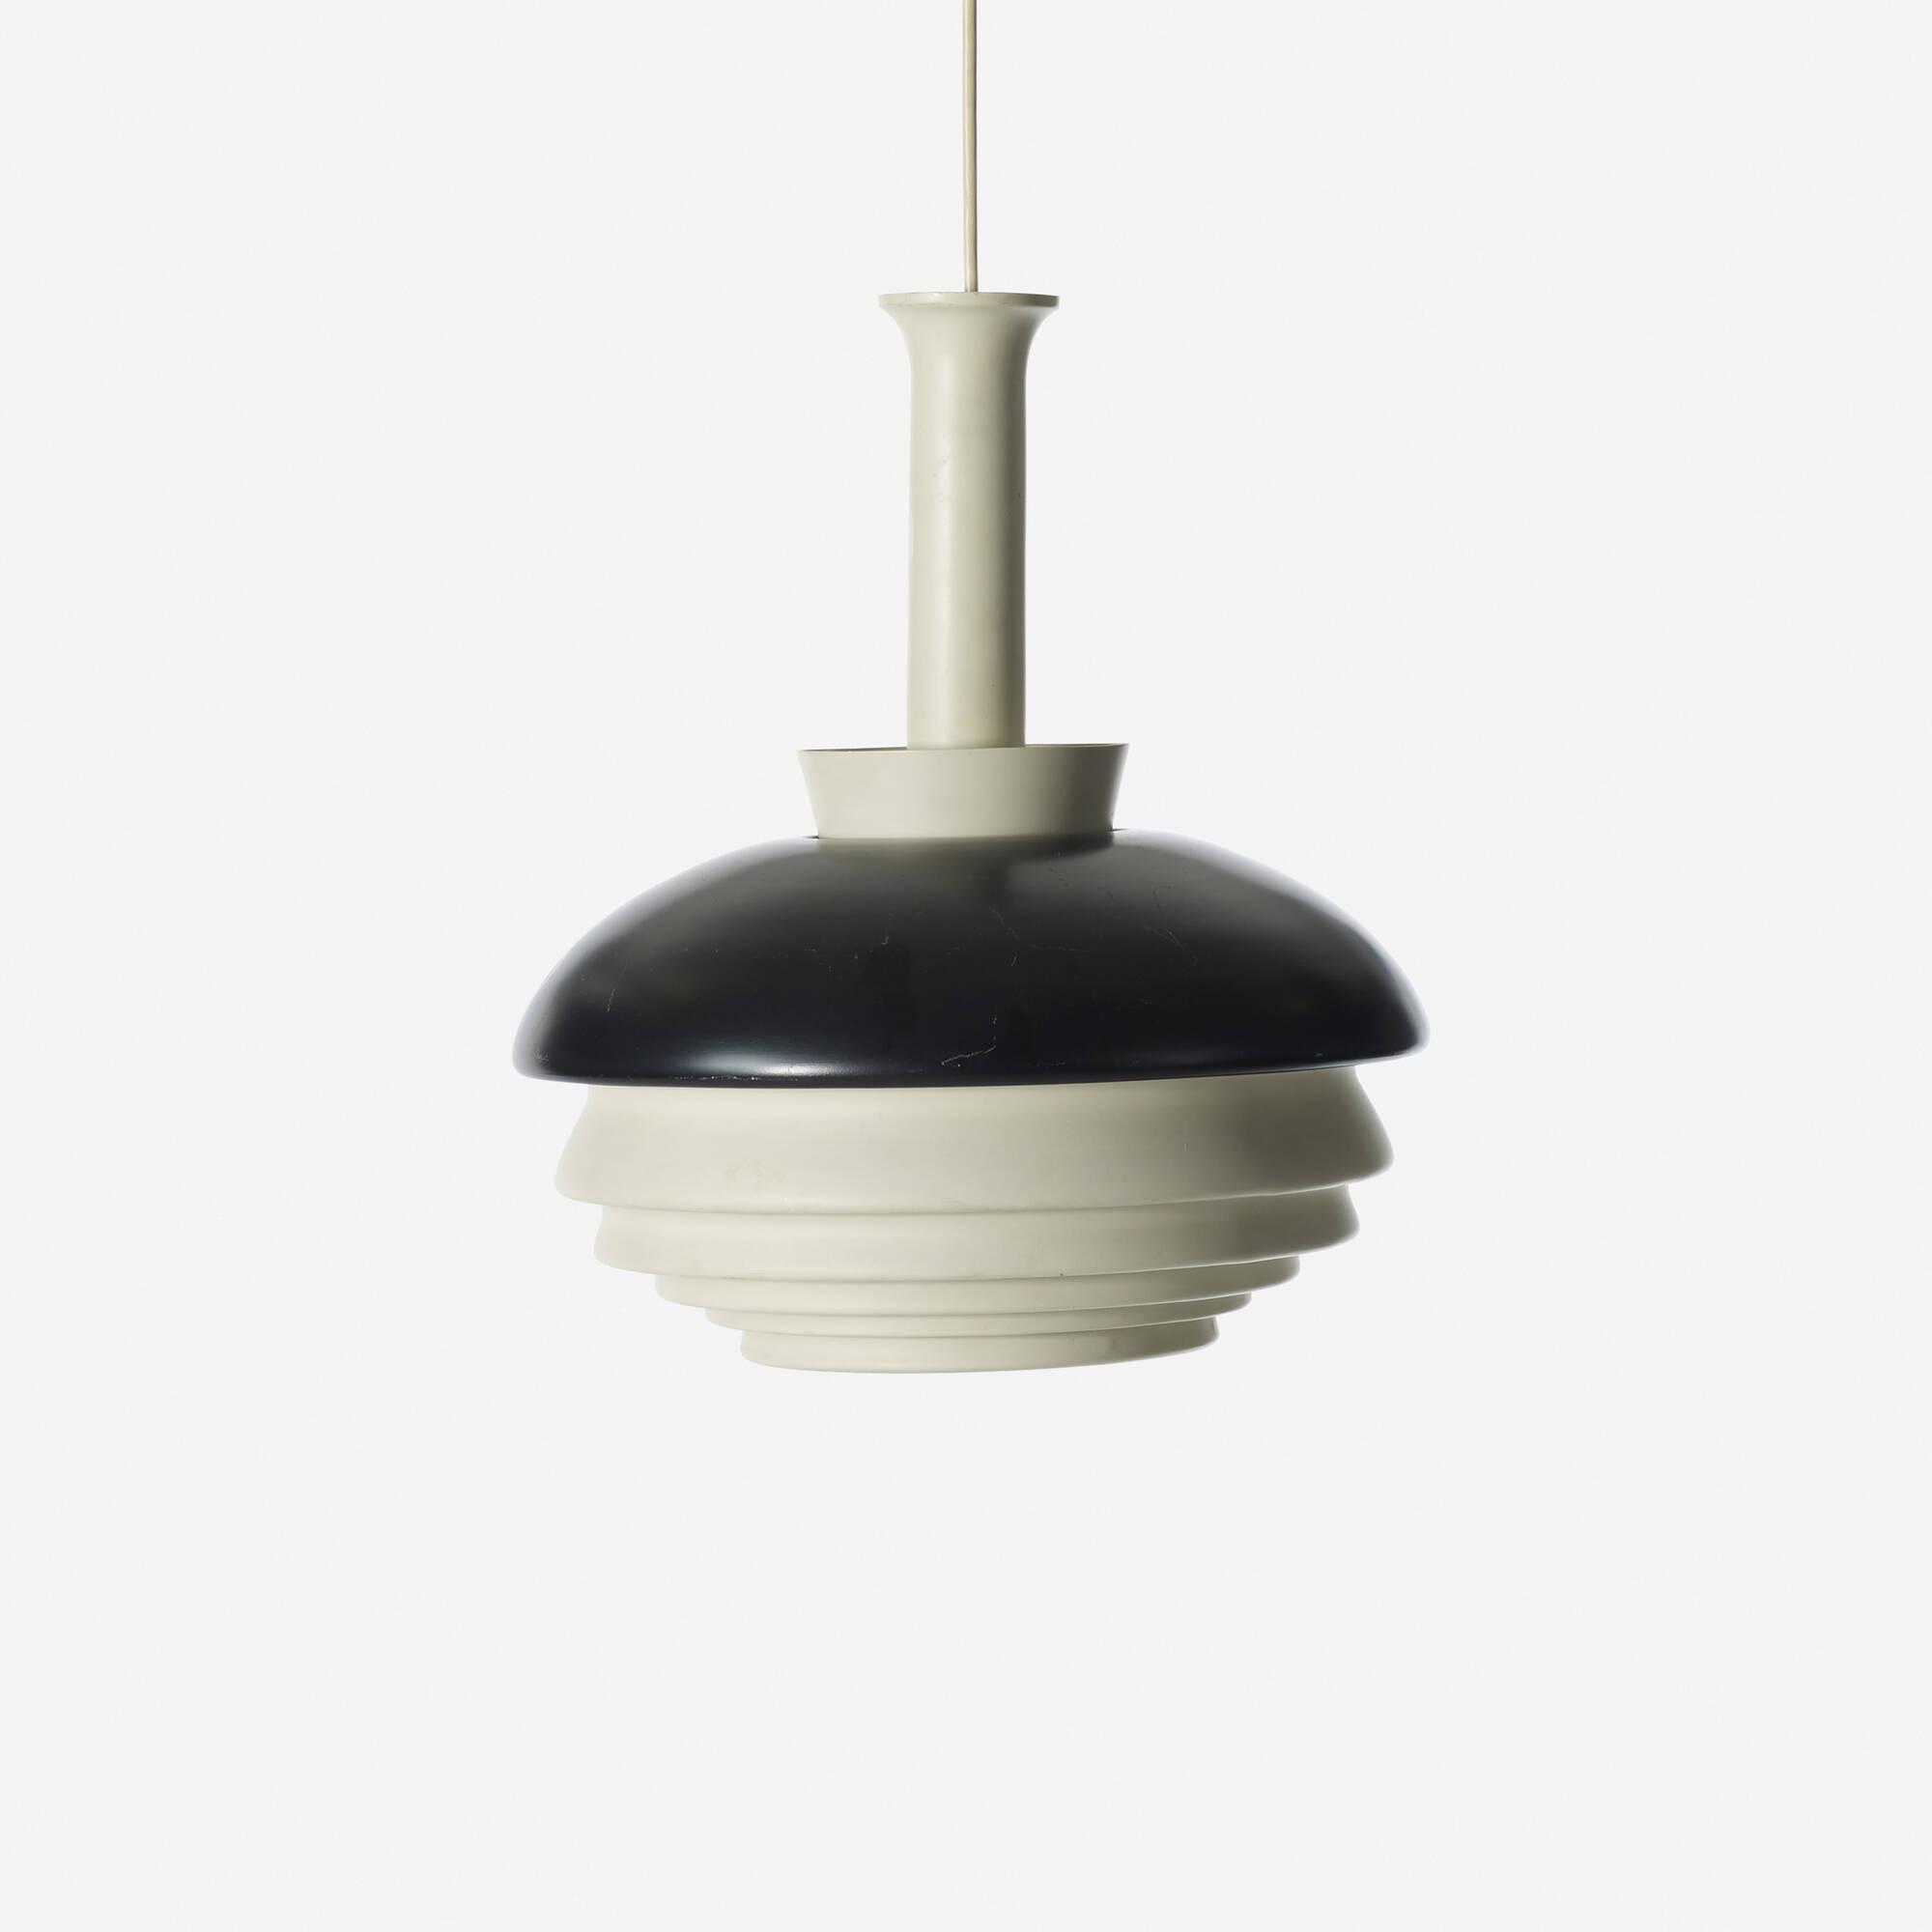 2x2 Ceiling Light Fixtures Design Ideas